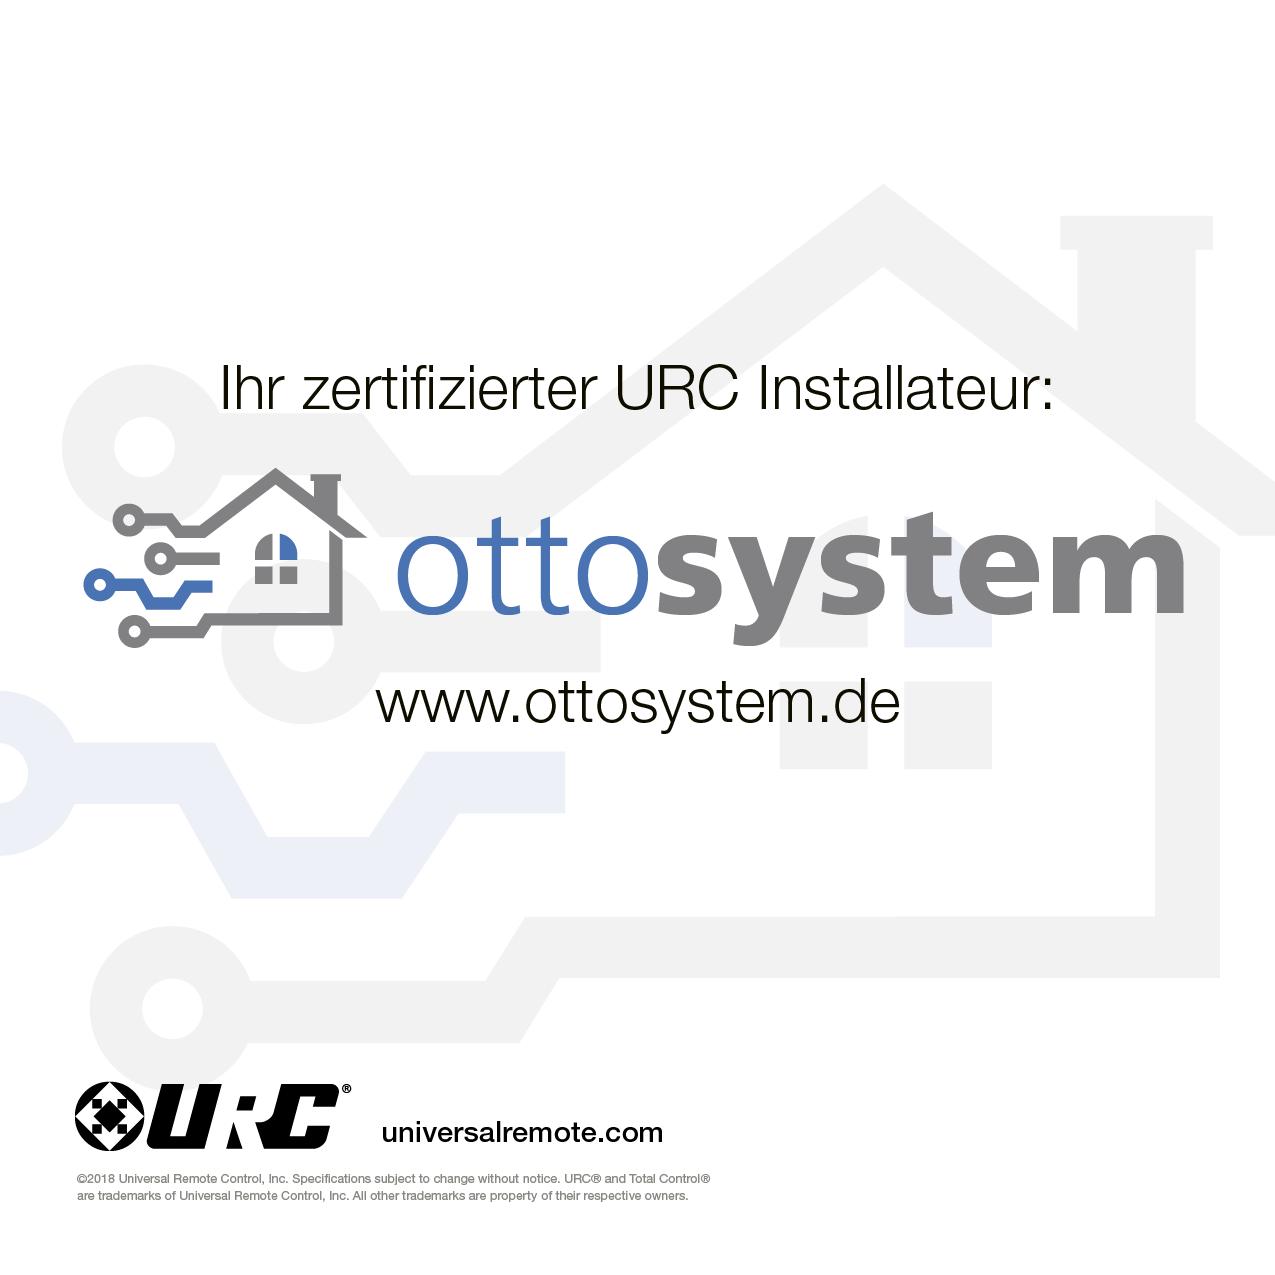 URC_Total_Control_ottosystem-24